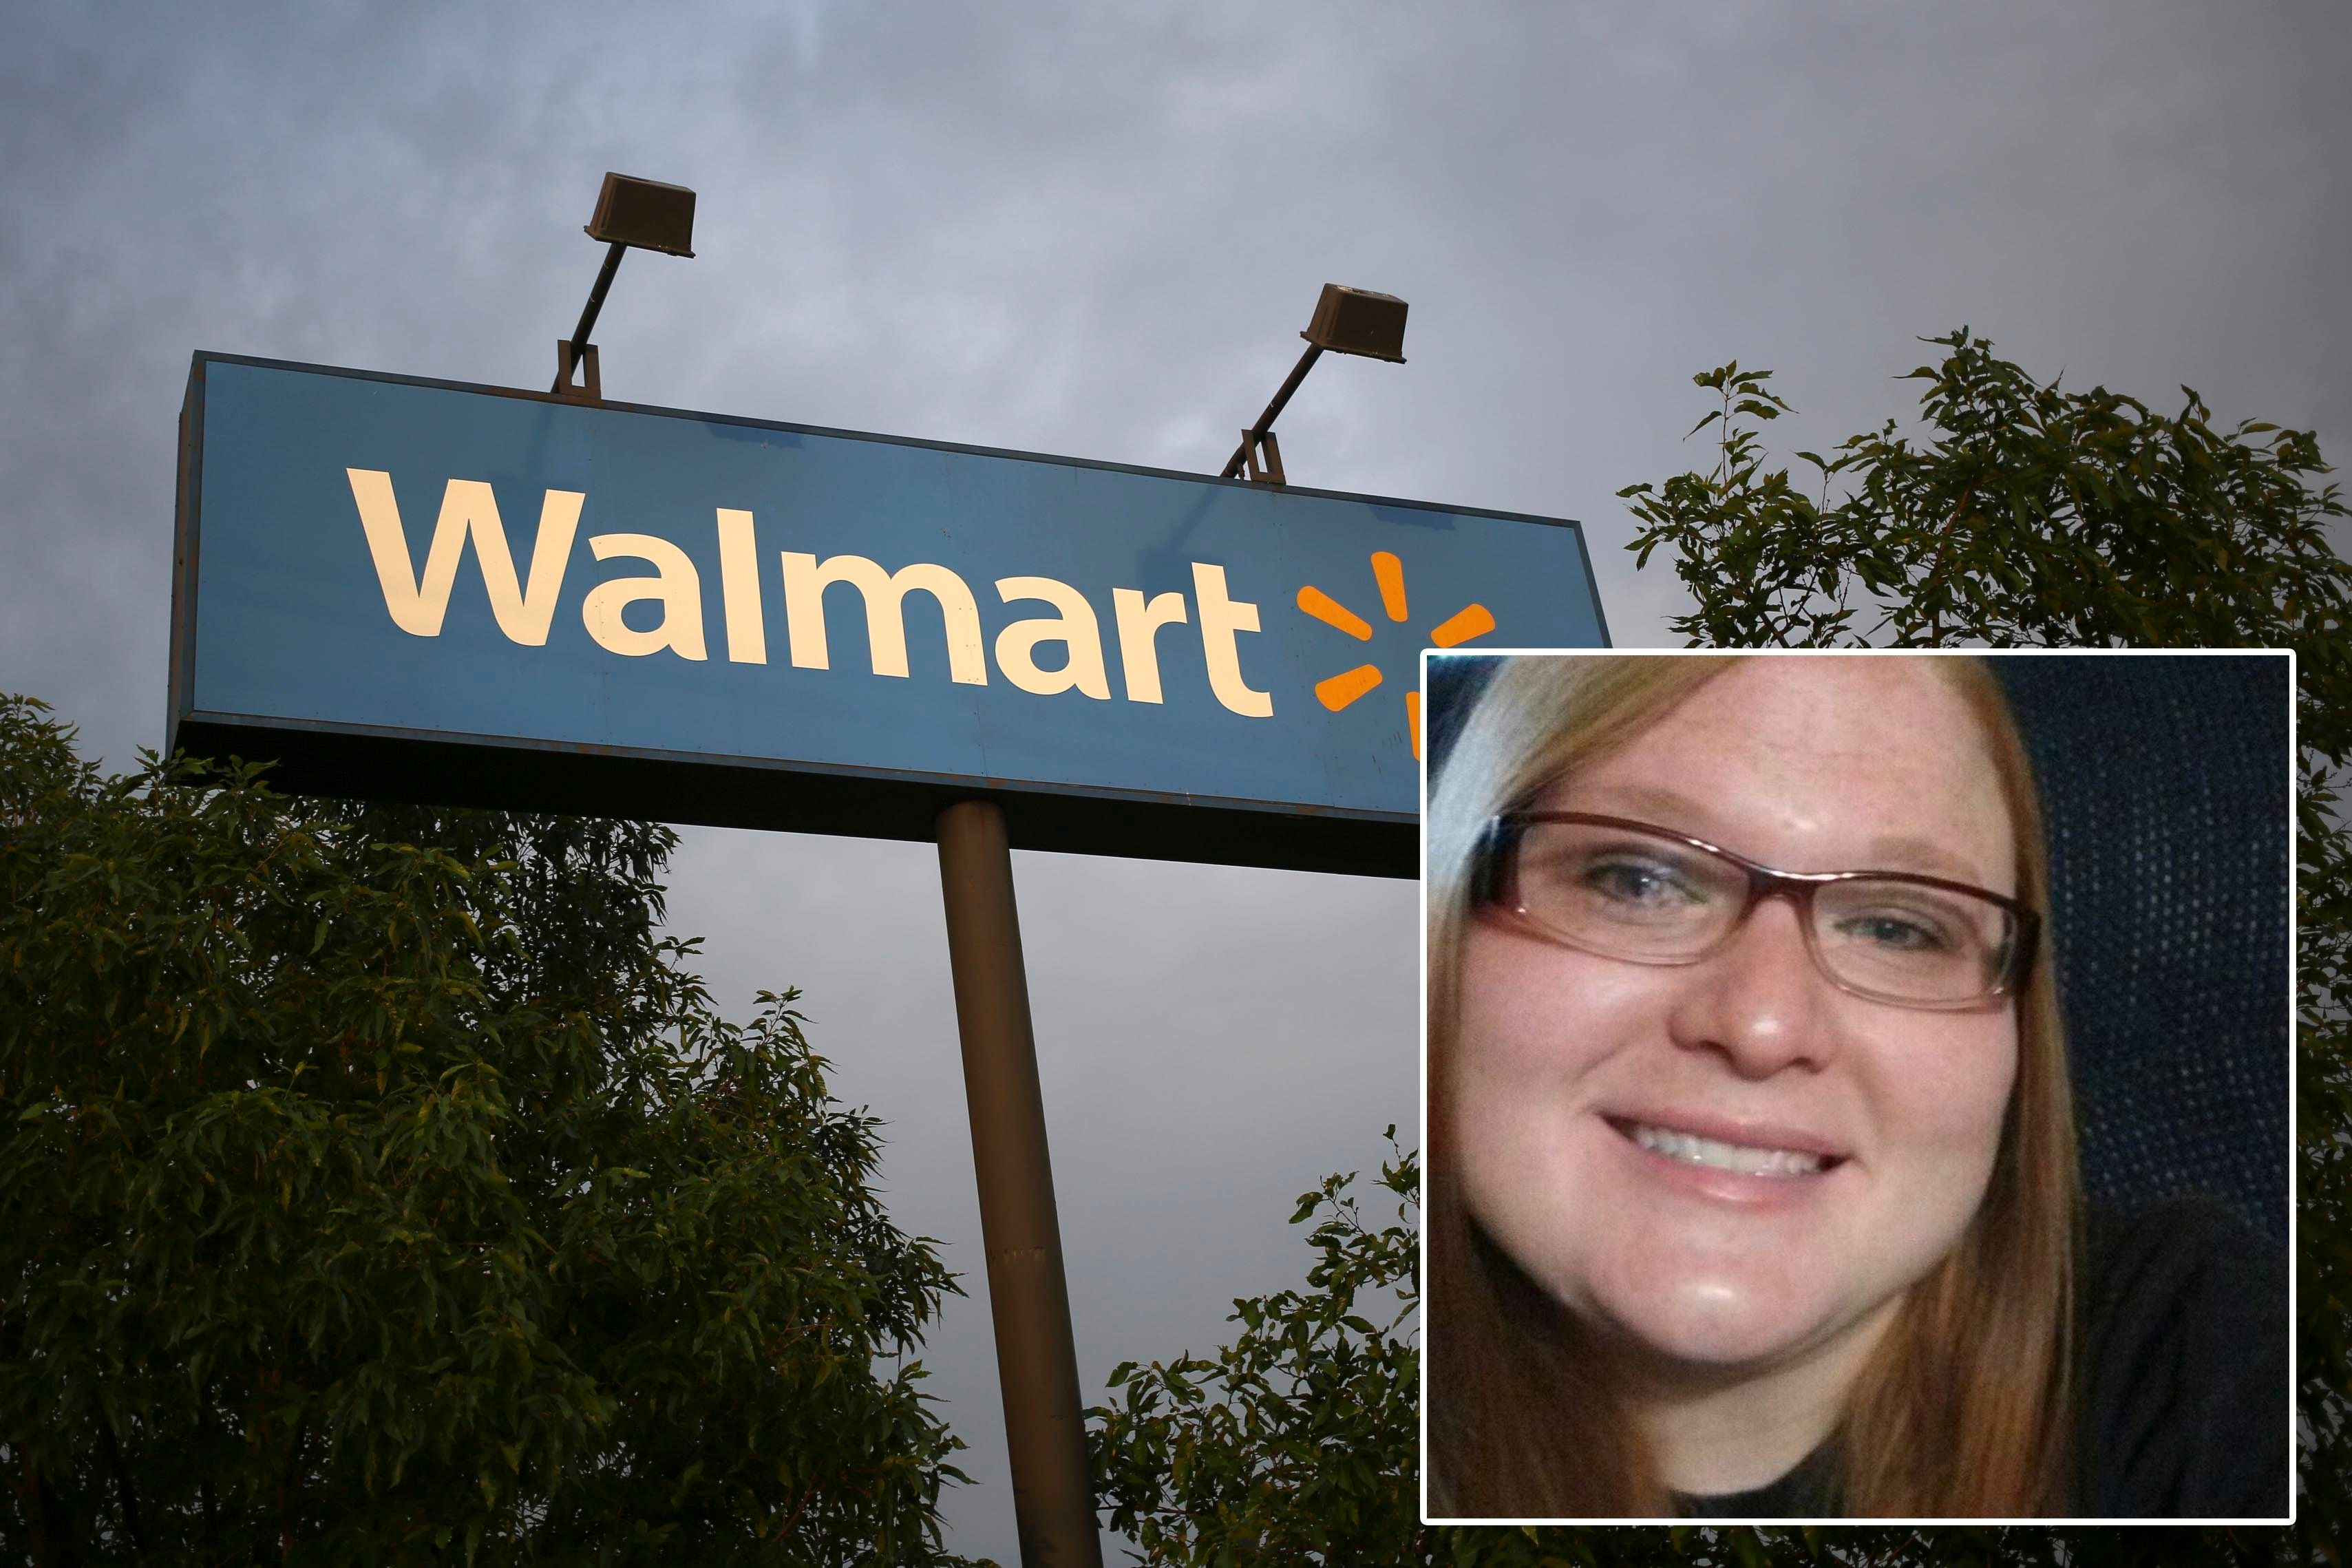 Bathroom Signs Walmart woman's body left in walmart bathroom for three days | huffpost